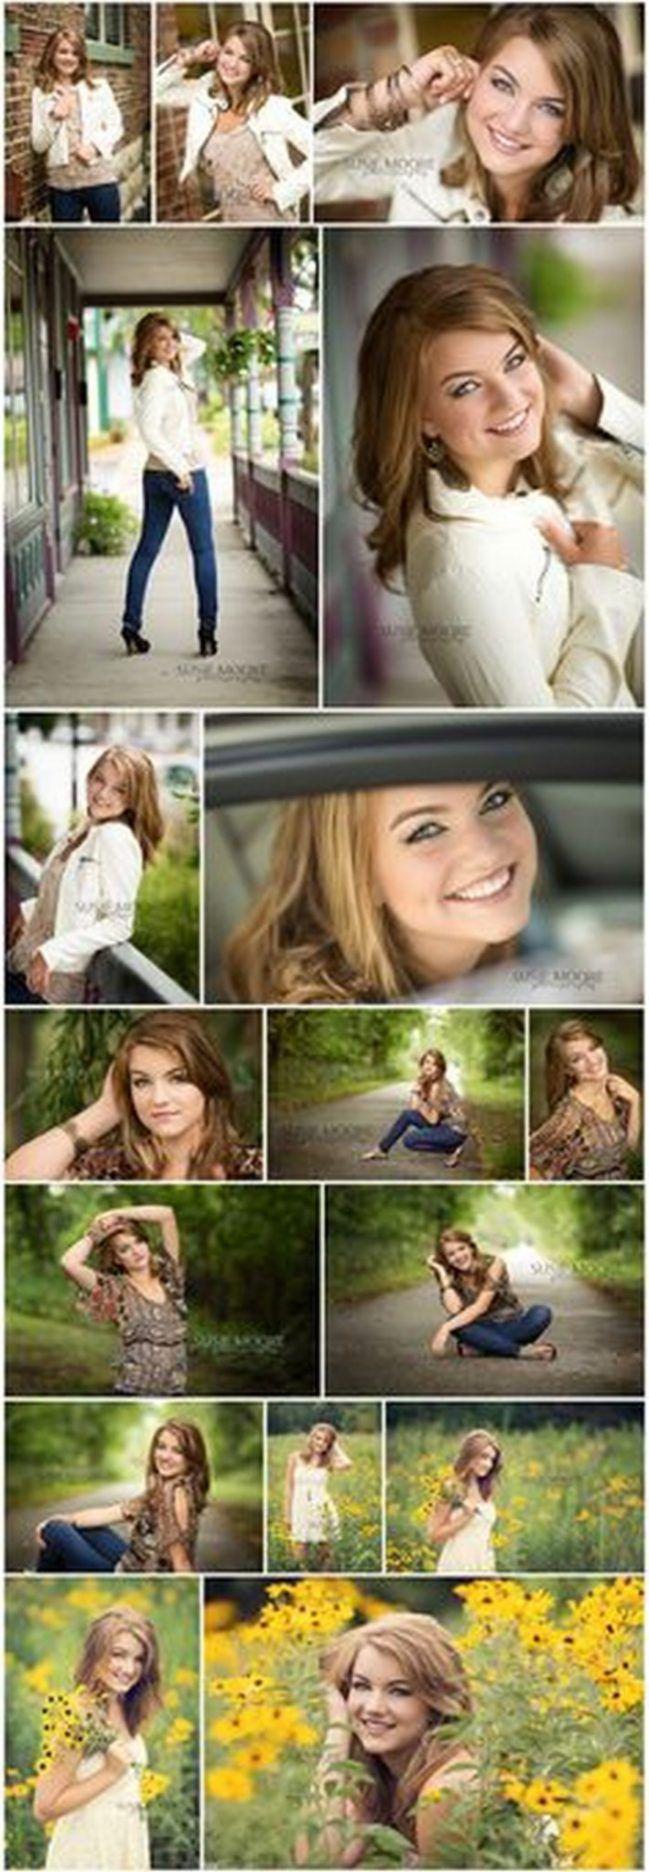 Senior pictures ideas for girls 37